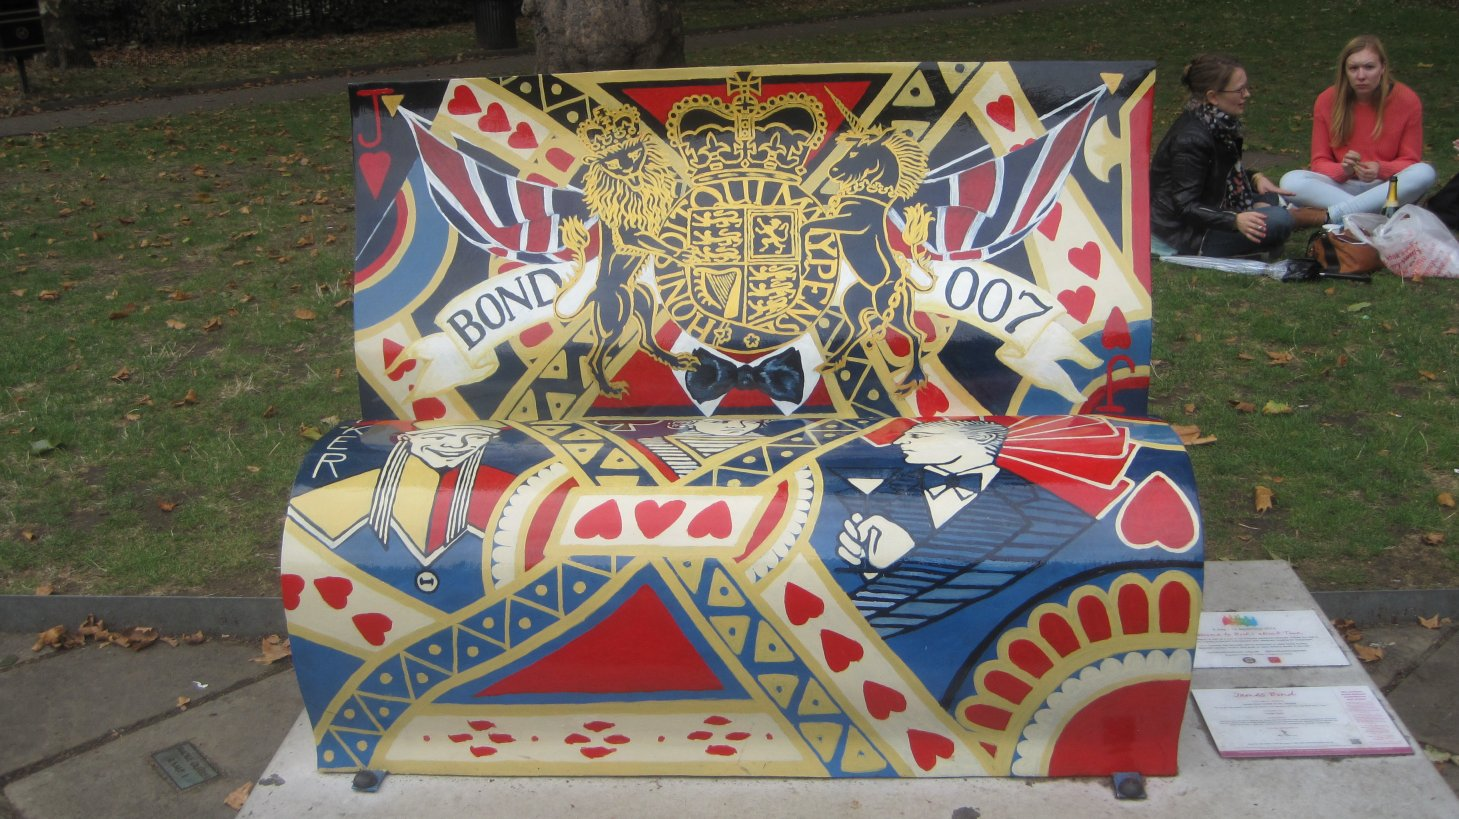 James Bond bench by Juliamaud